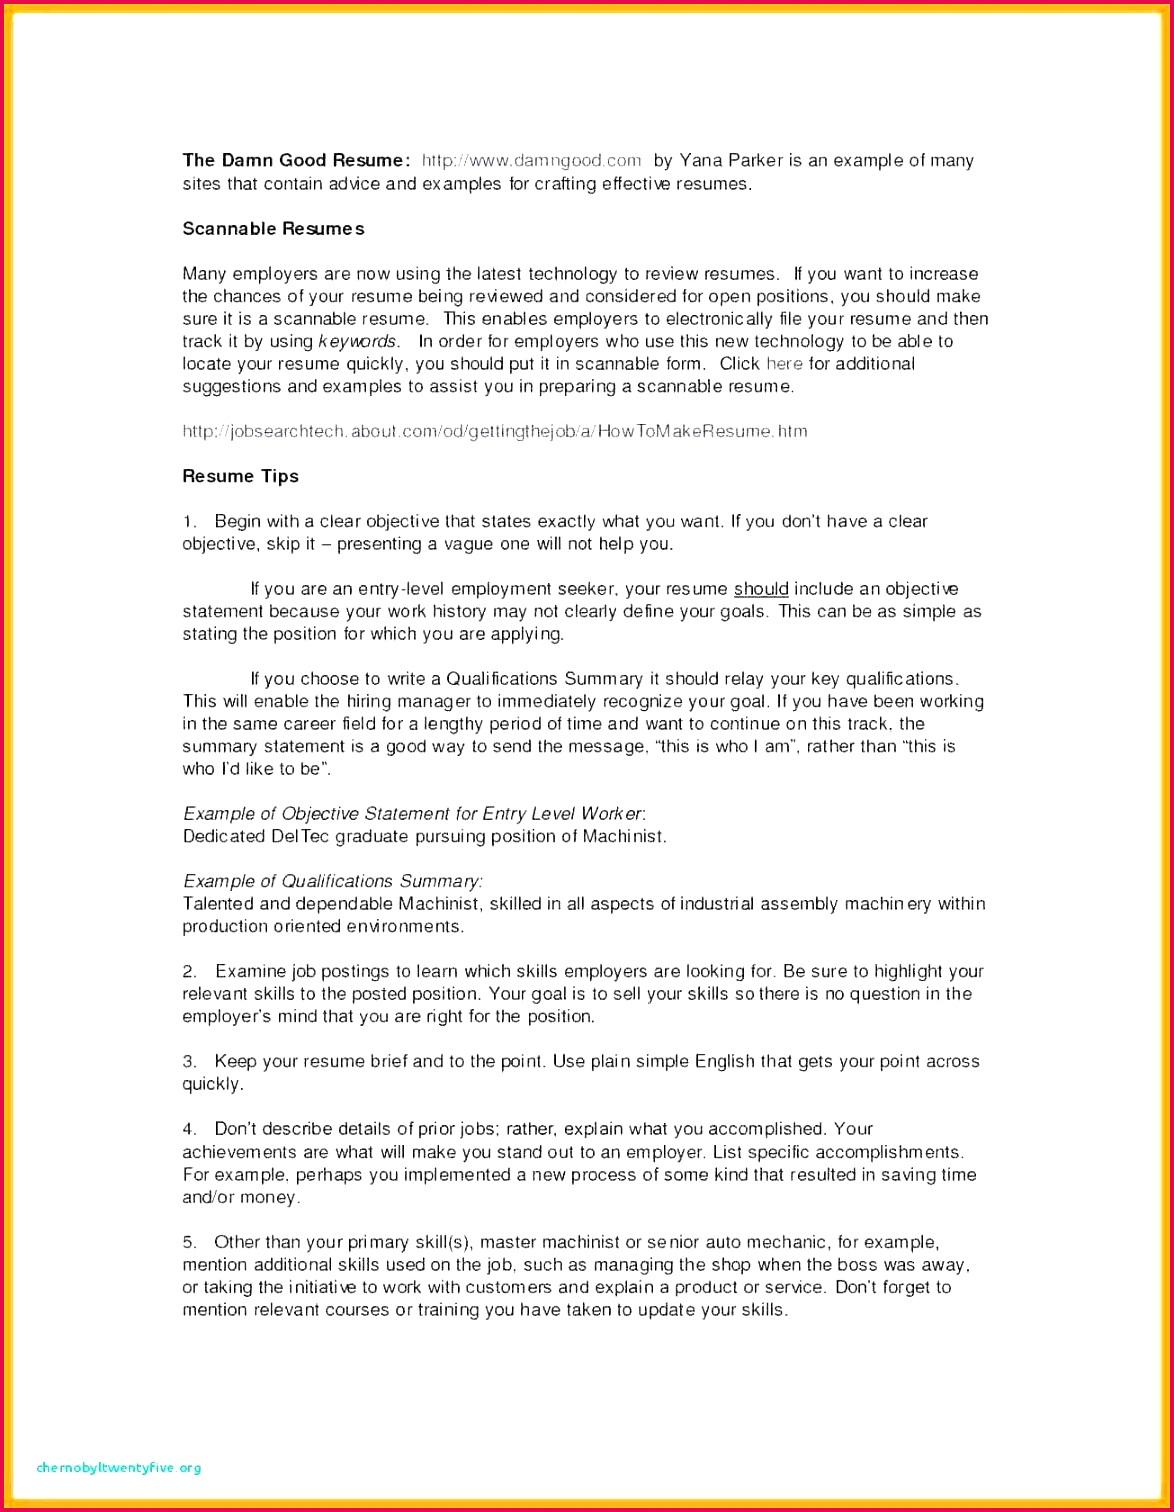 024 employment verification letter template word valid thomasdegasperi of